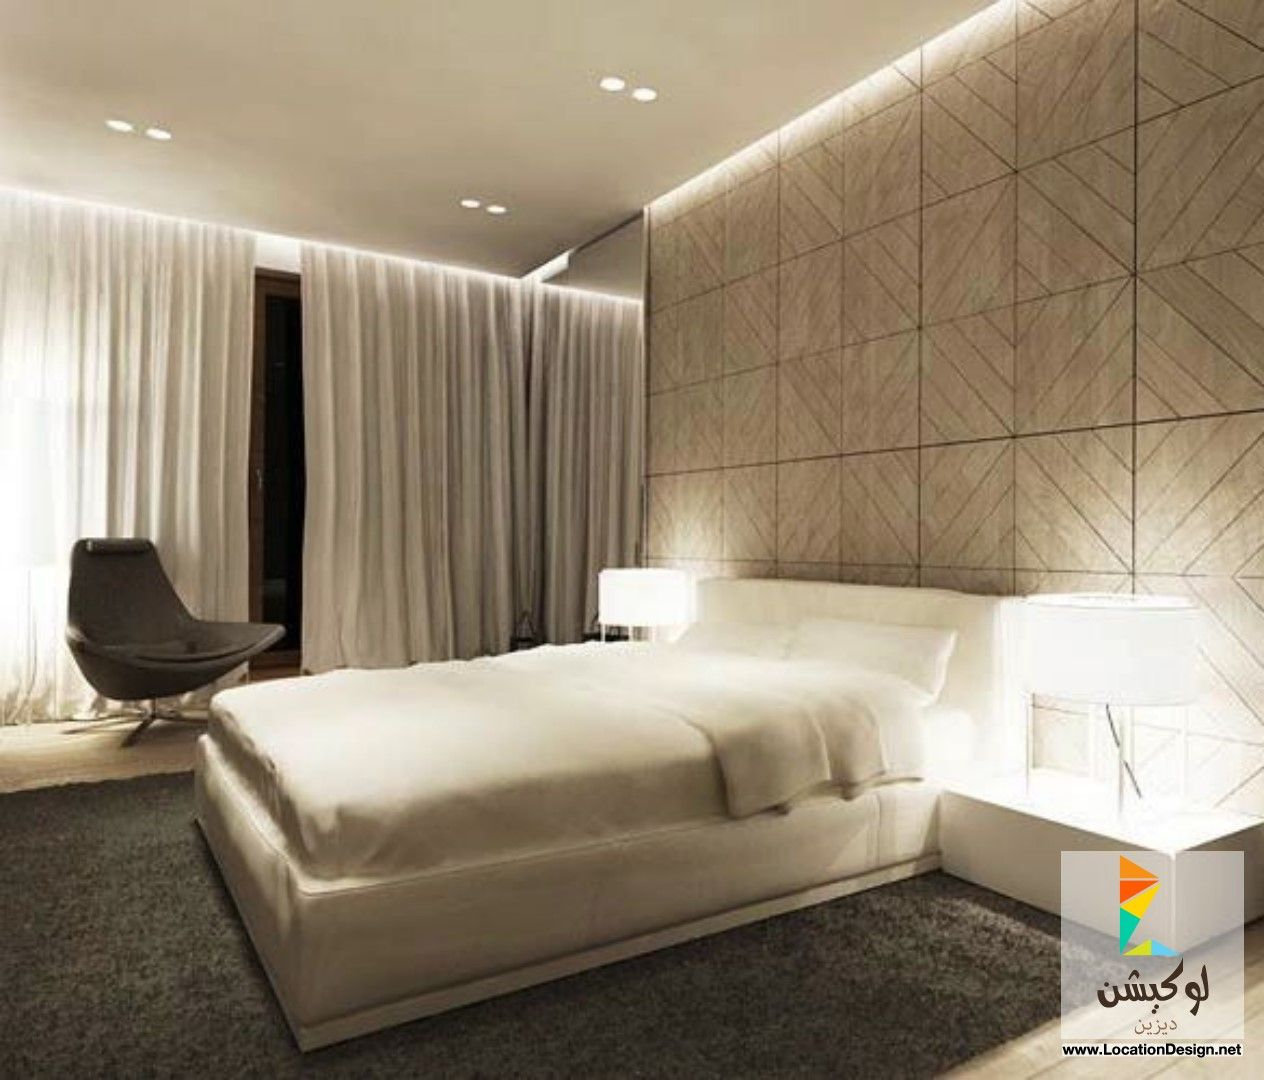 غرف نوم مودرن للعرسان 2015 لوكيشن ديزاين تصميمات ديكورات أفكار جديدة مصر Locationdesign Com Modern Bedroom Bedroom Interior Luxurious Bedrooms